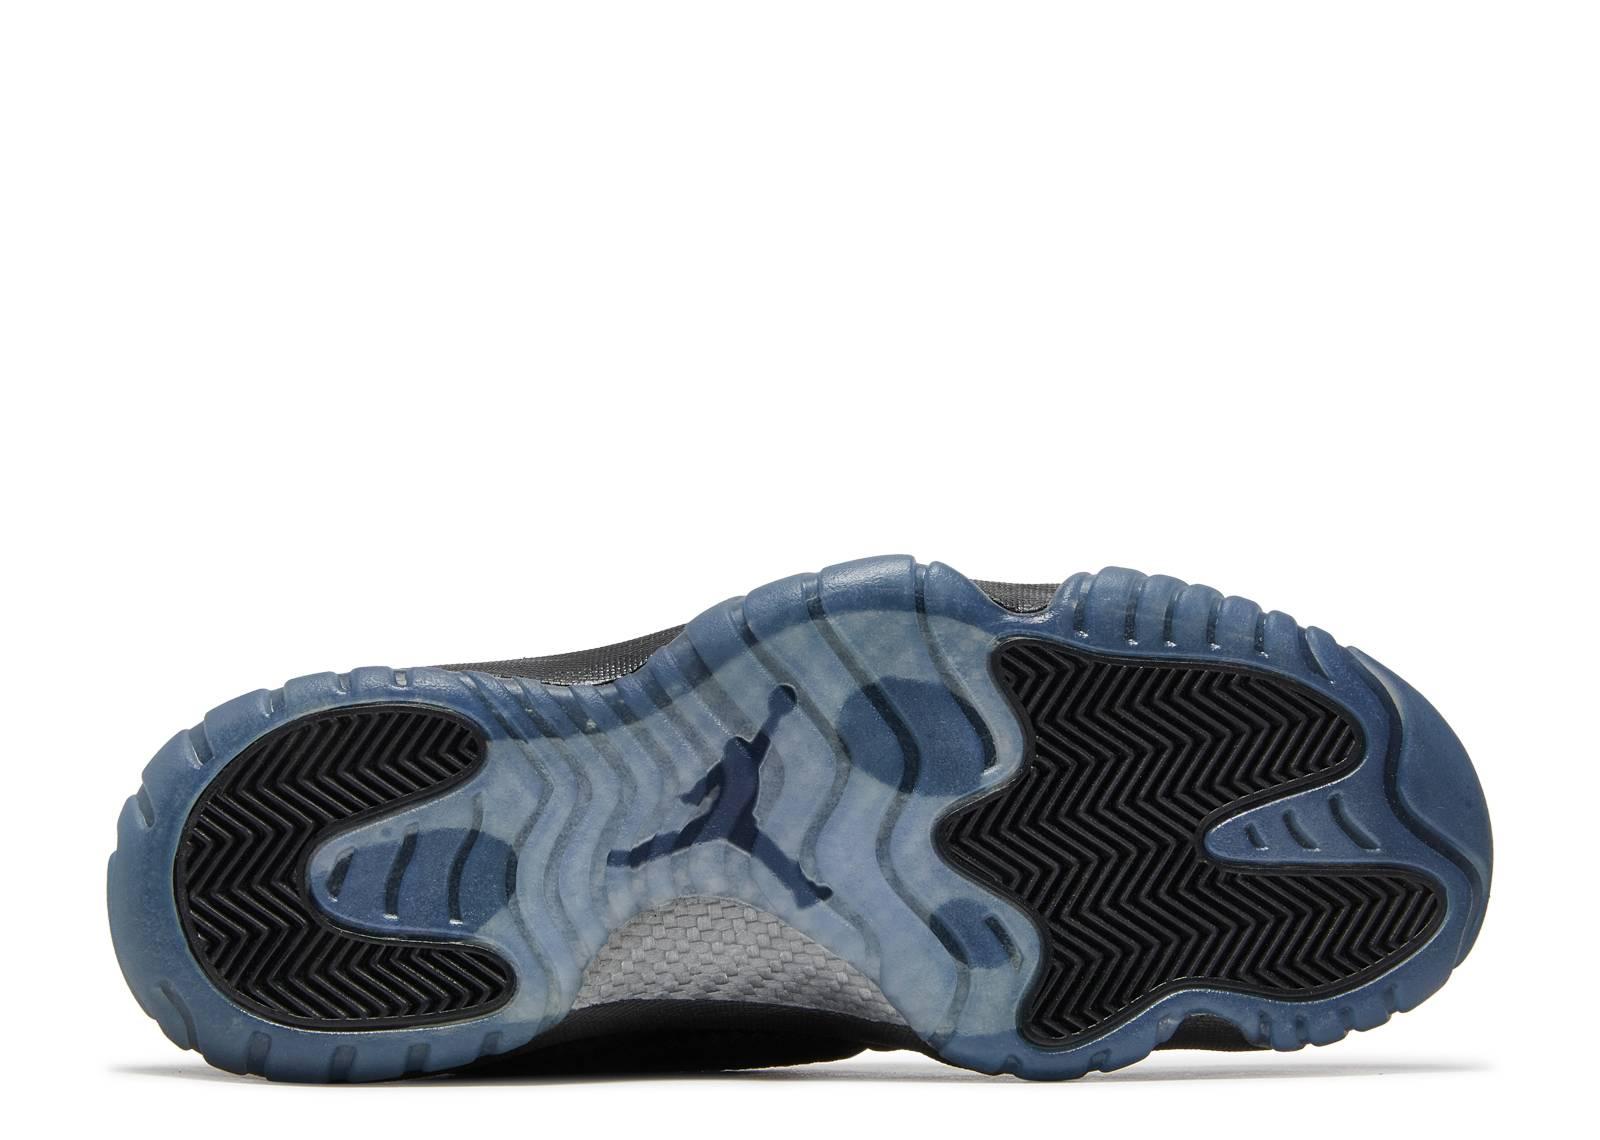 buy popular 4141d 854a4 ... air jordan retro 9 gamma blue silver ...